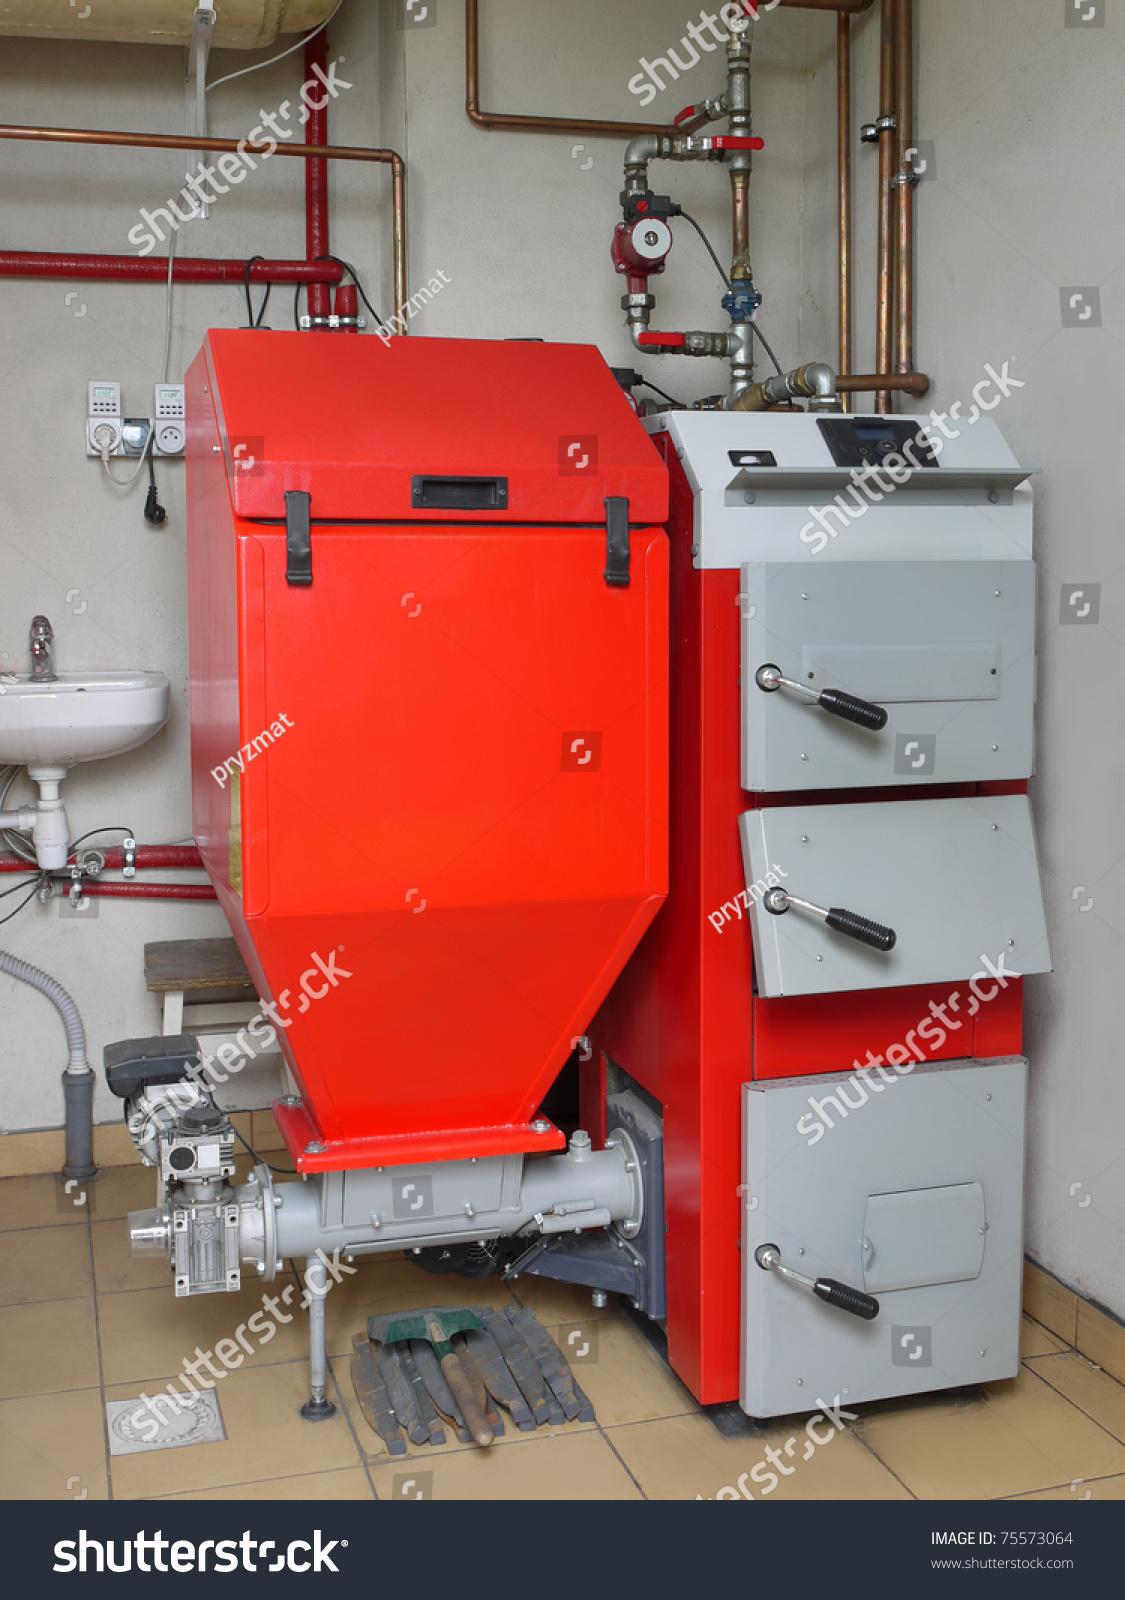 House Boiler Room Coalfired Central Heating Stock Photo